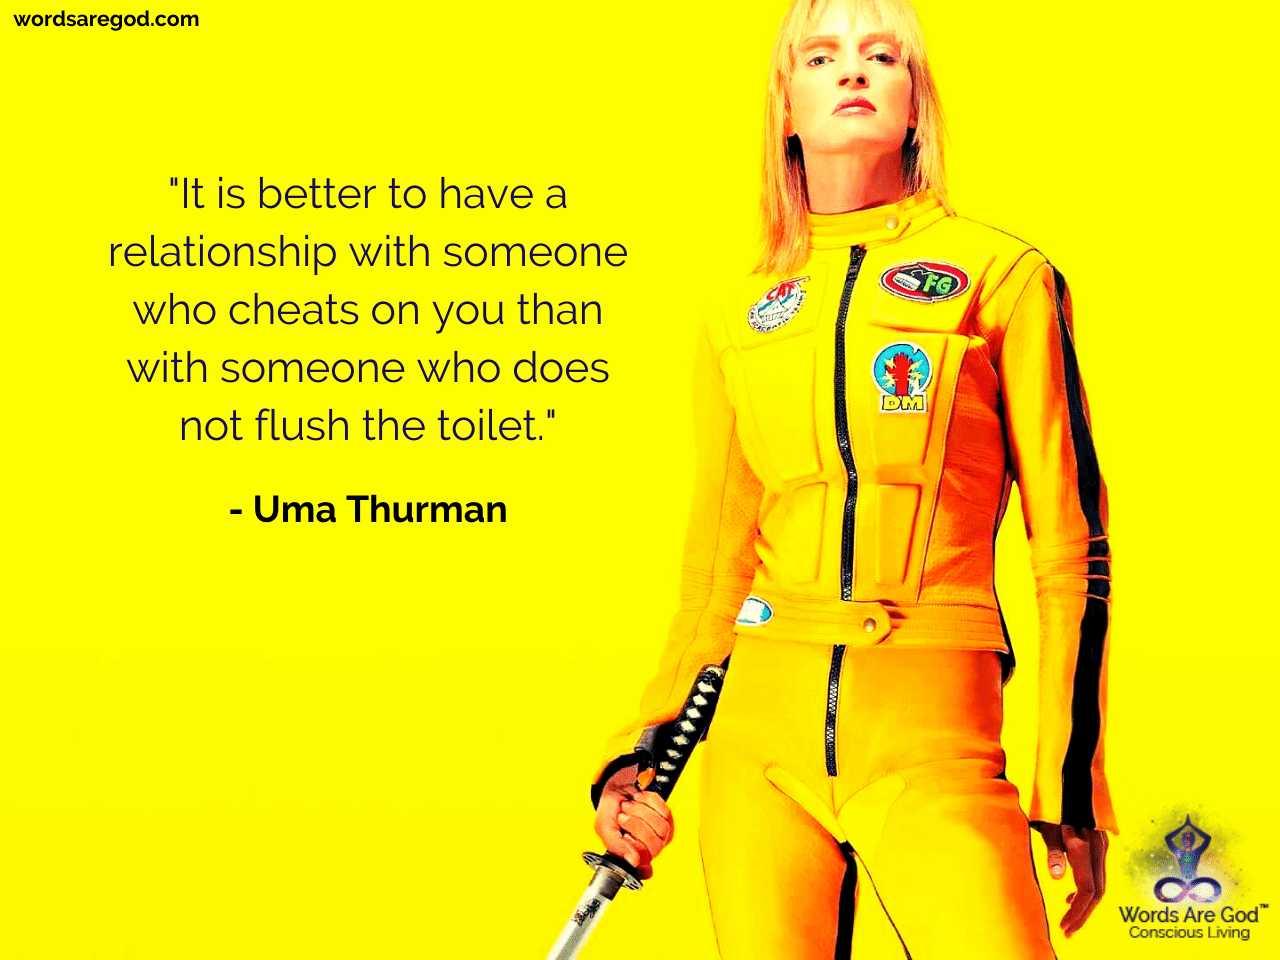 Uma Thurman Life Quote by Uma Thurman